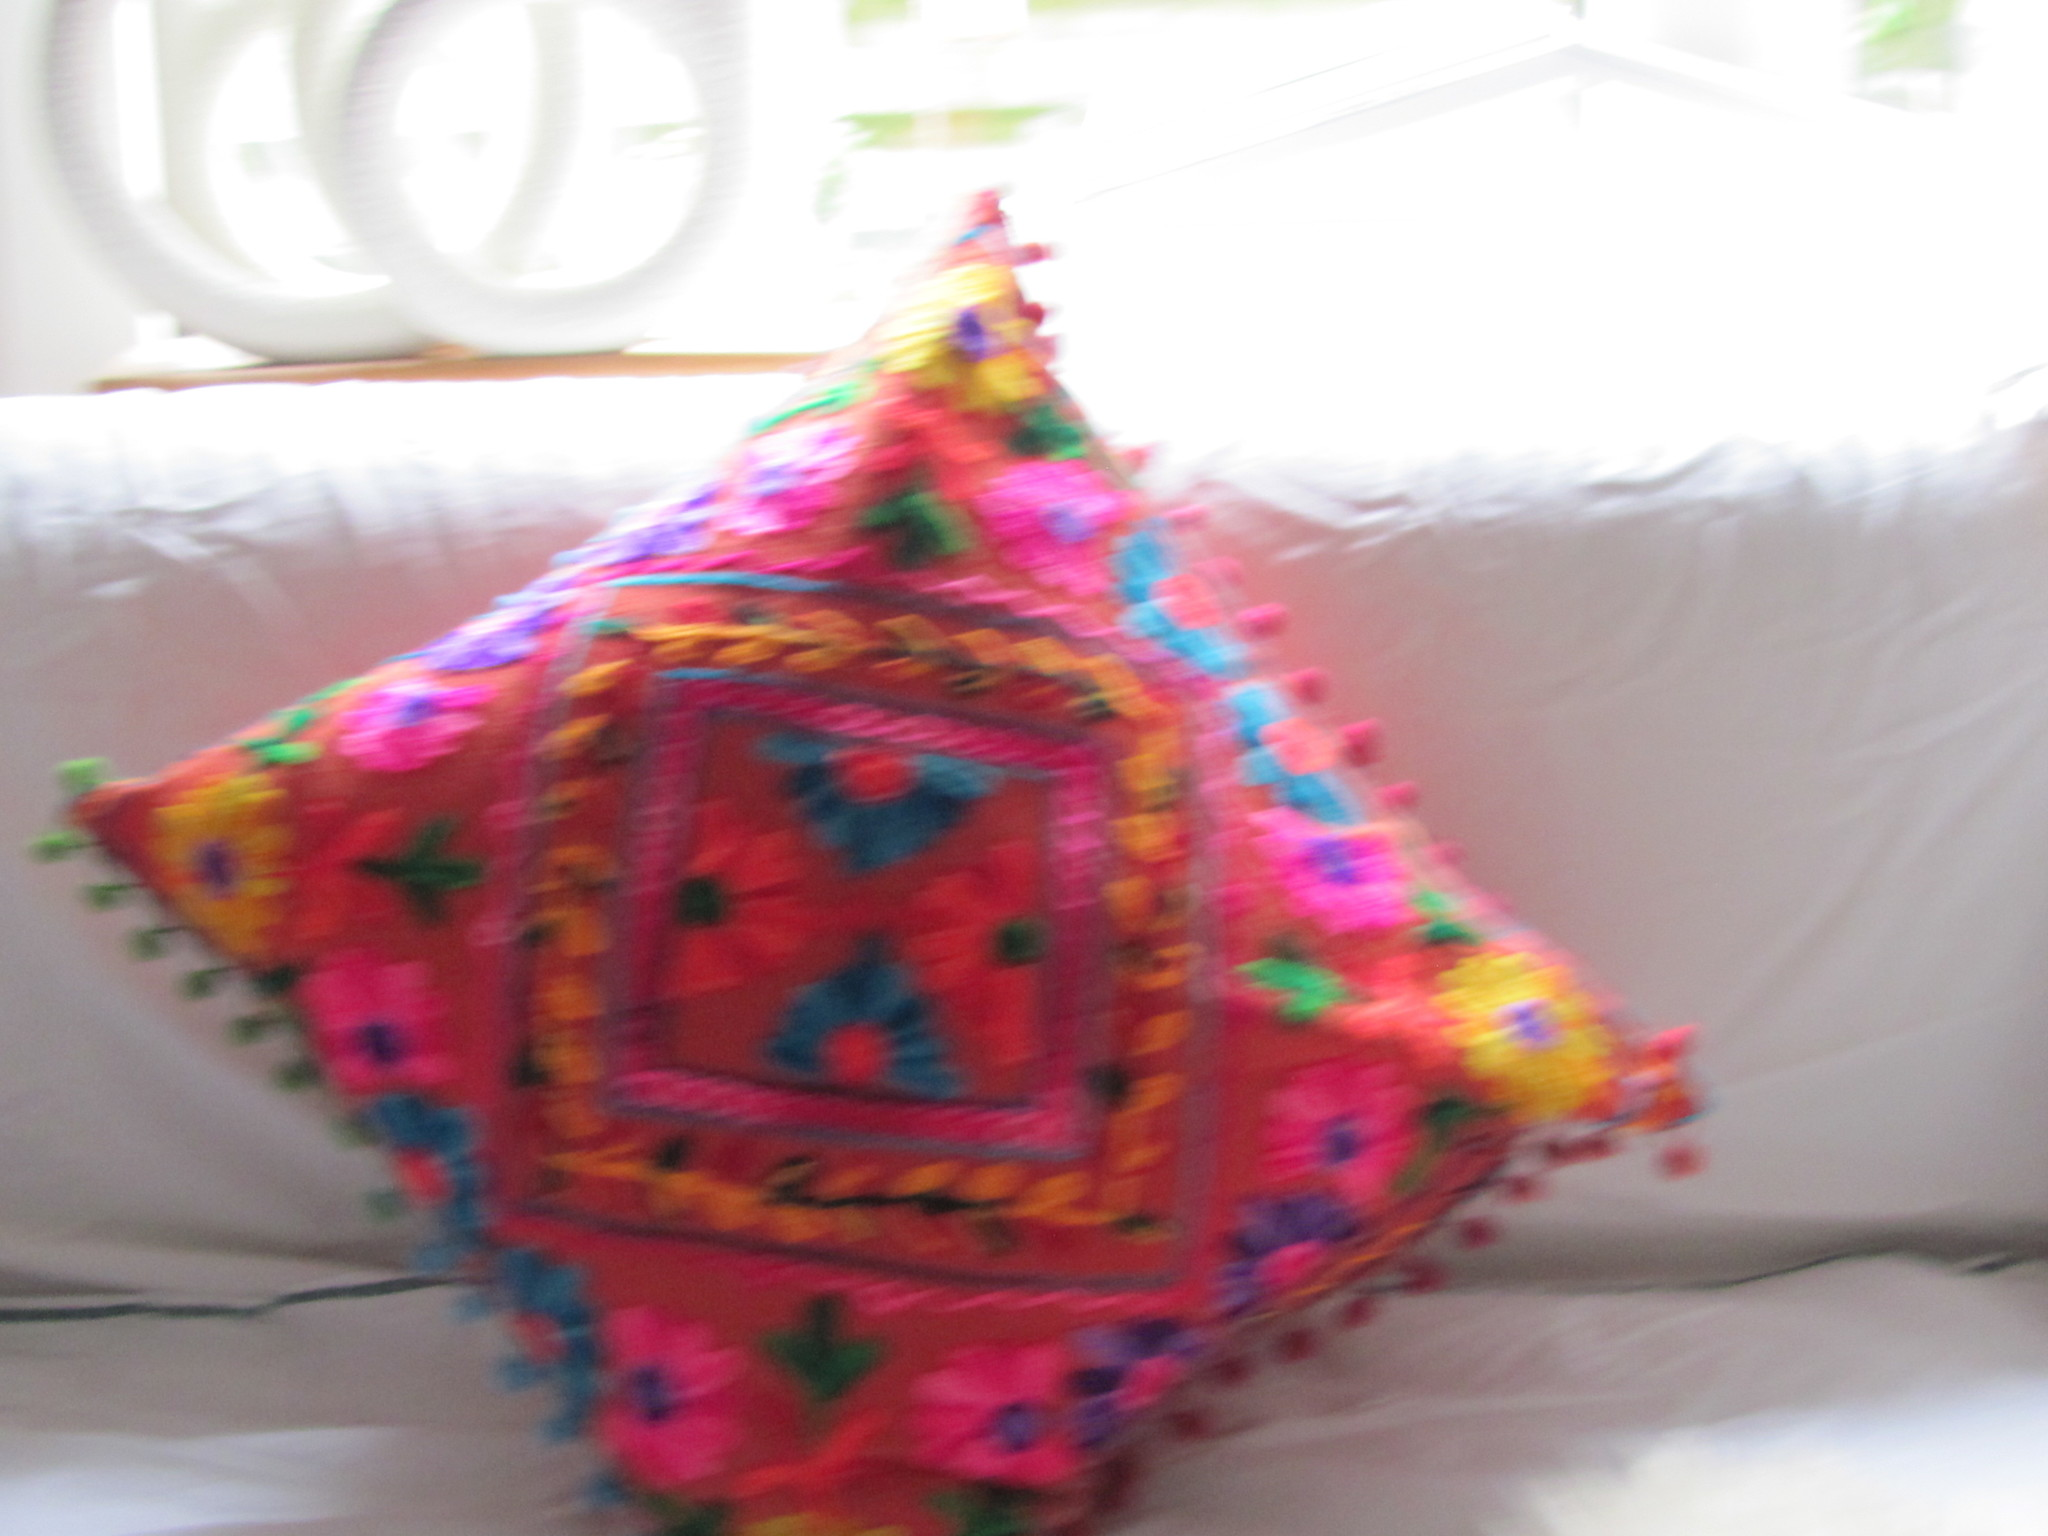 cushion cover susani embroiderd in Uzbeki style  brickred ground